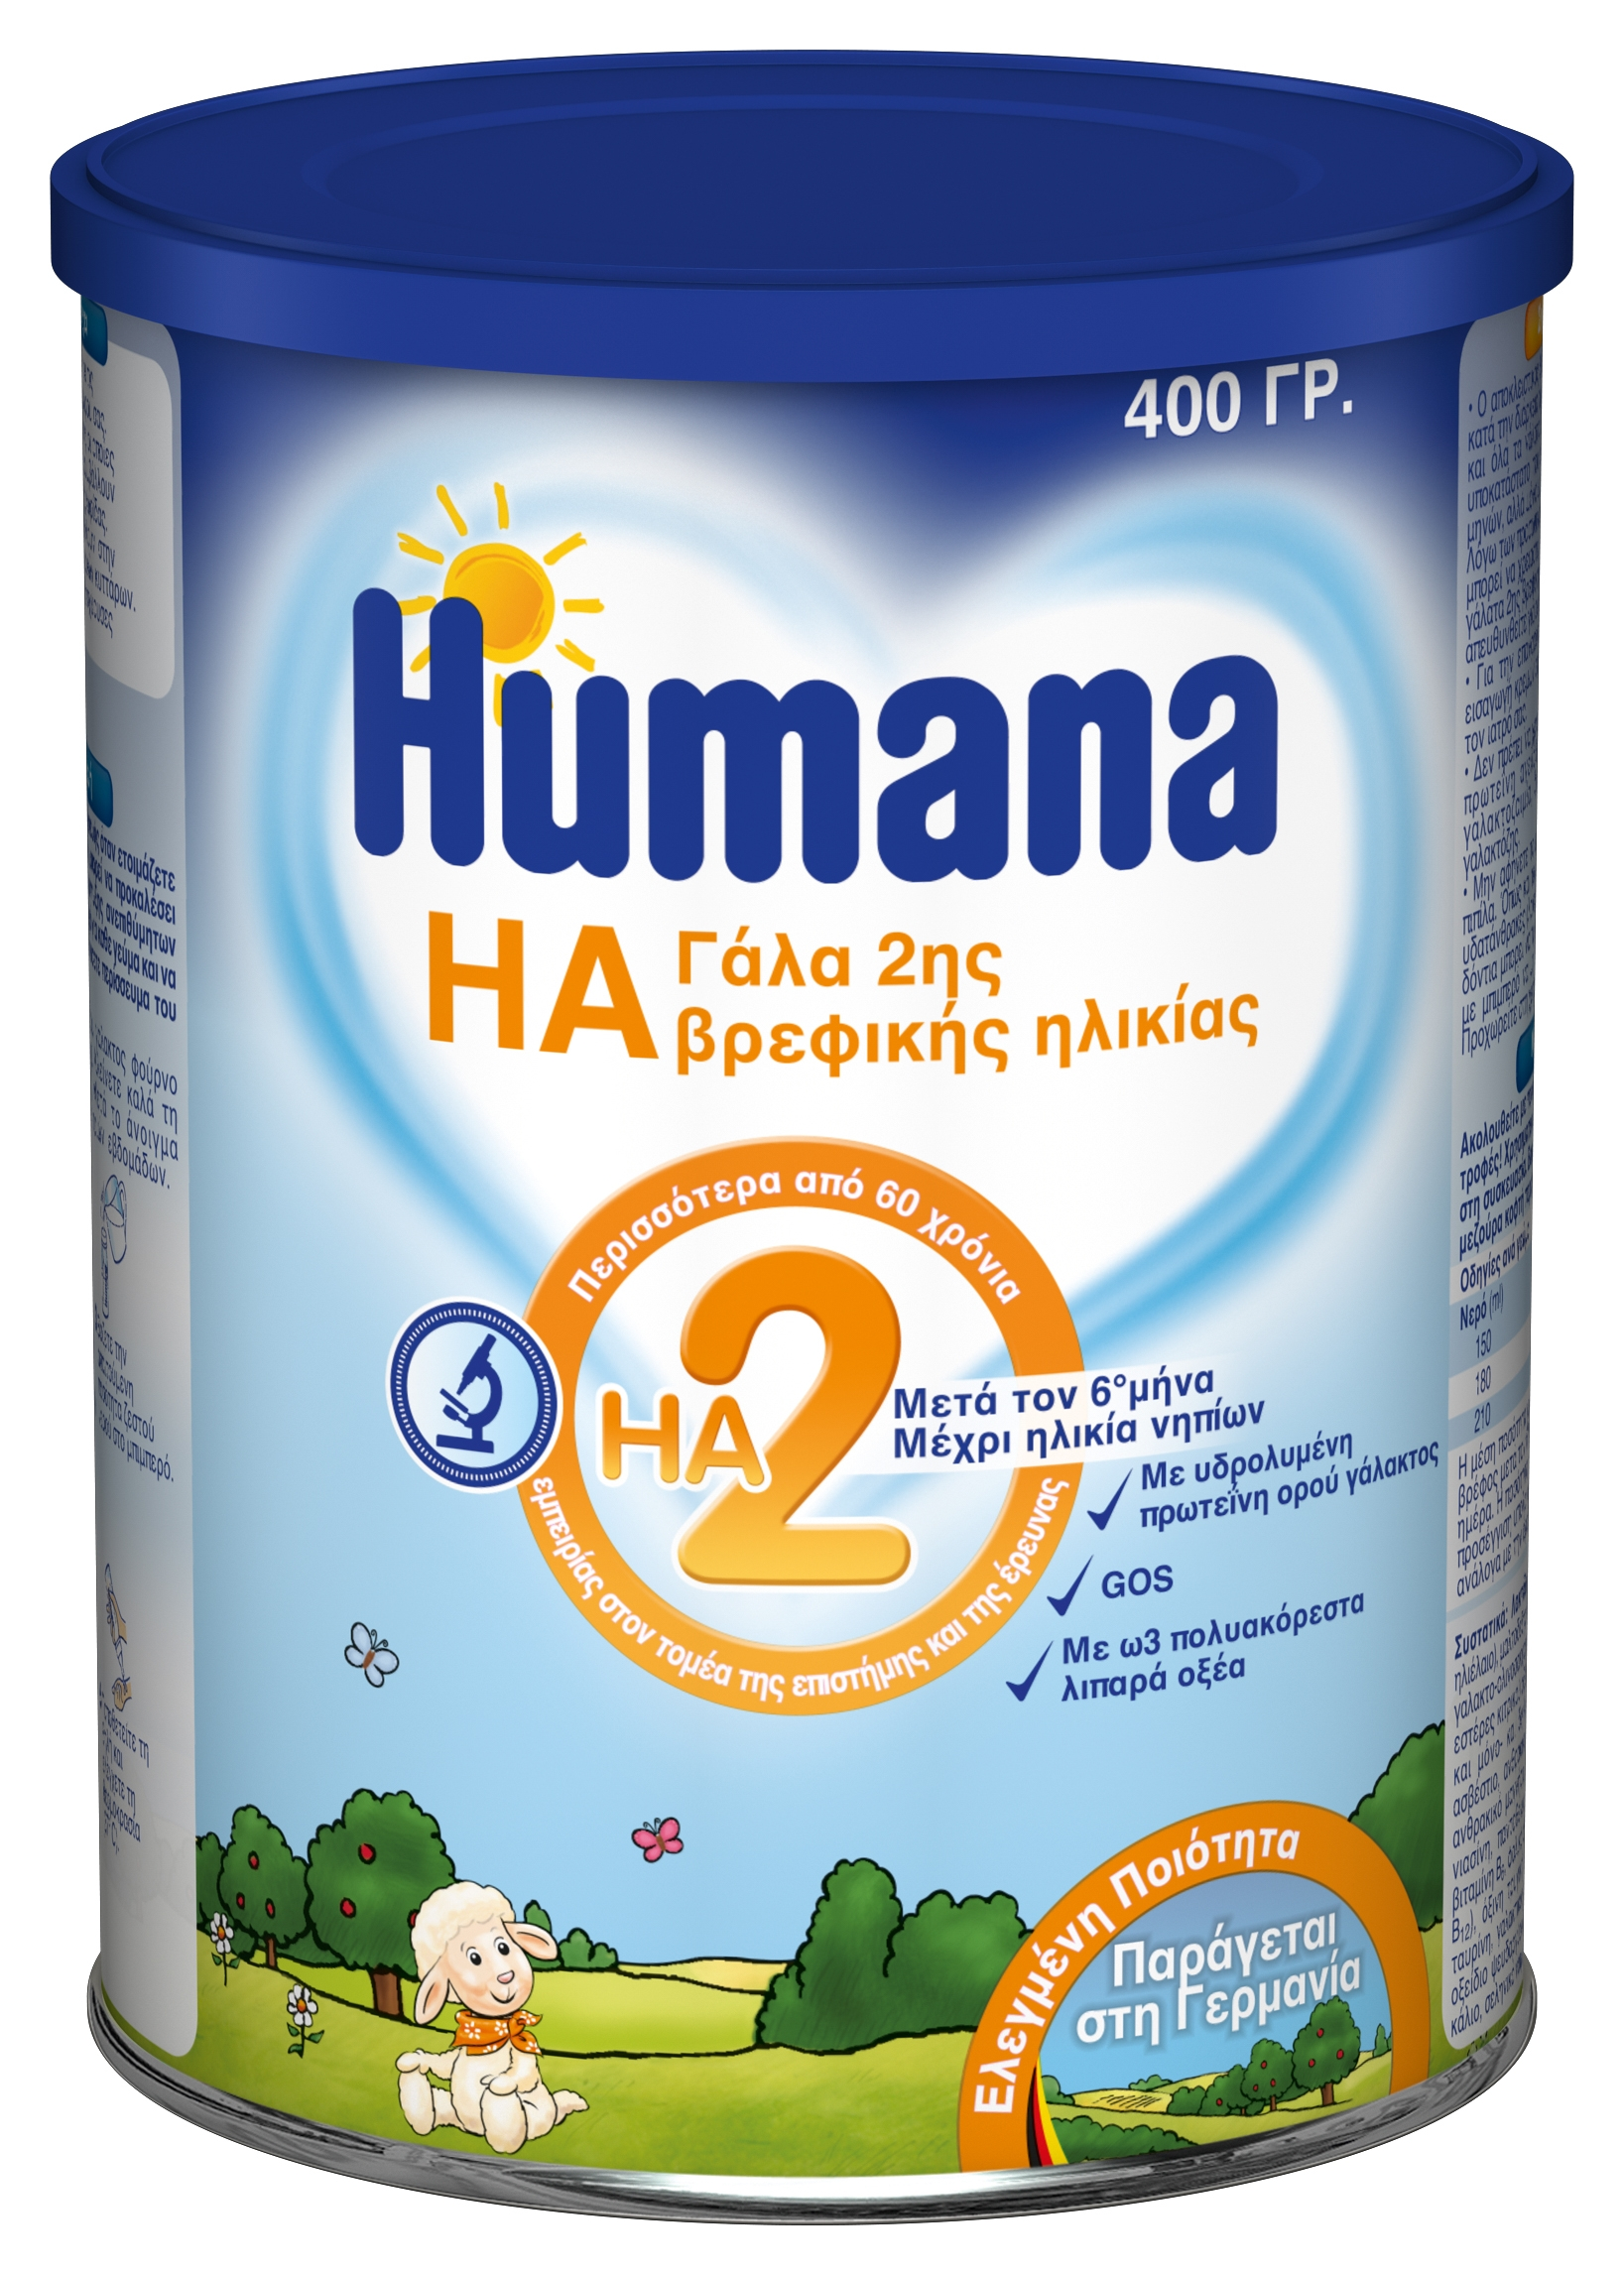 9dcd1eb8991 Humana HA 2, Υποαλλεργικό Γάλα 2ης Βρεφικής Ηλικίας, 400 gr | Wecare ...